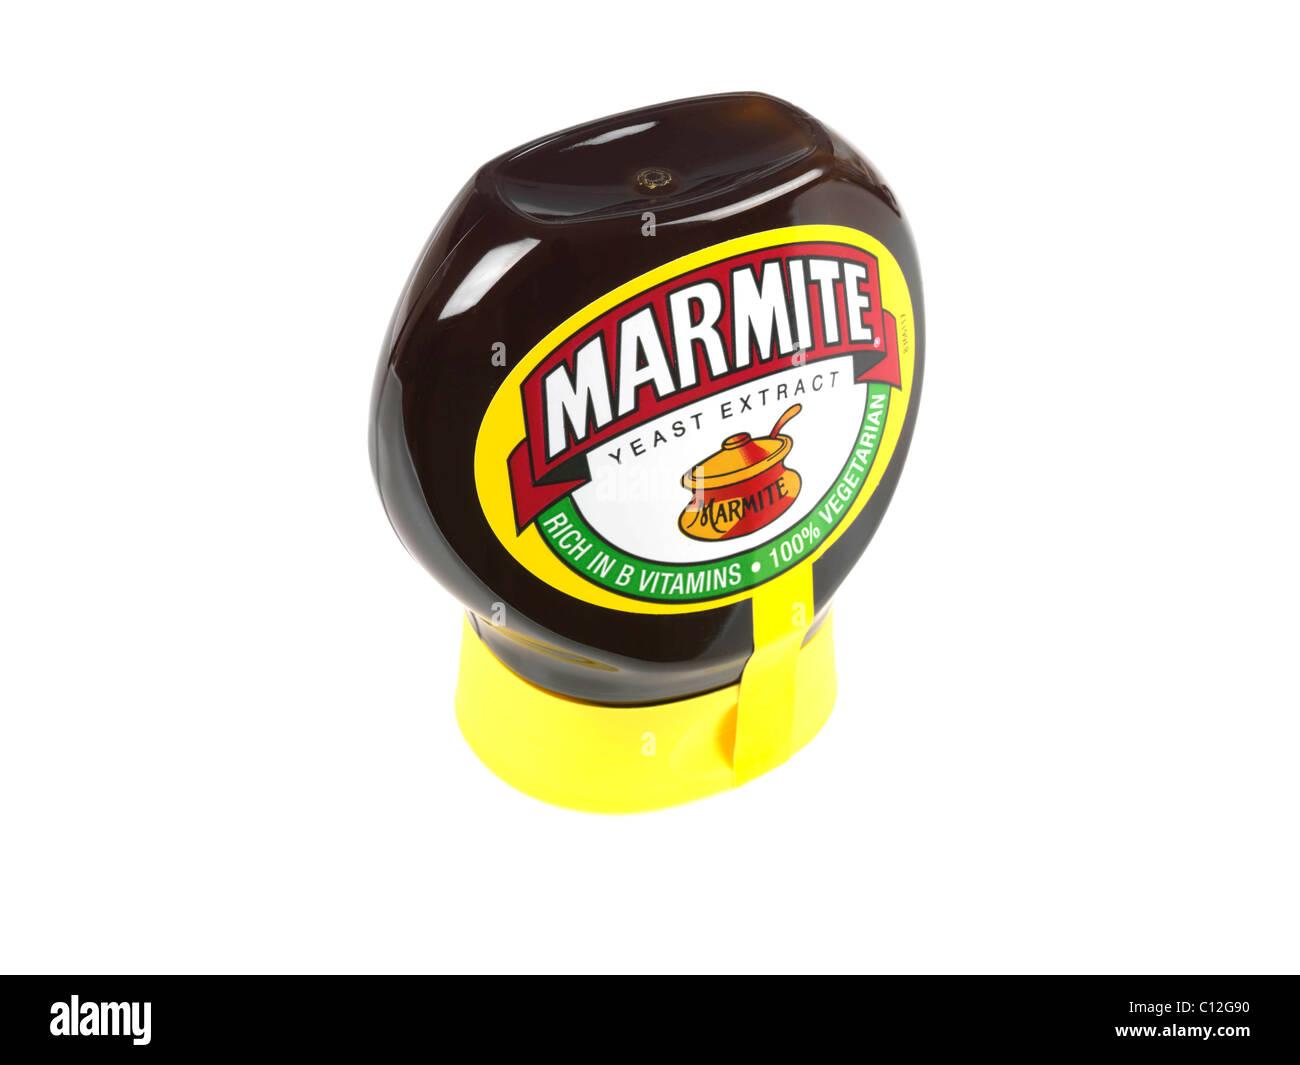 Marmite Yeast Extract - Stock Image